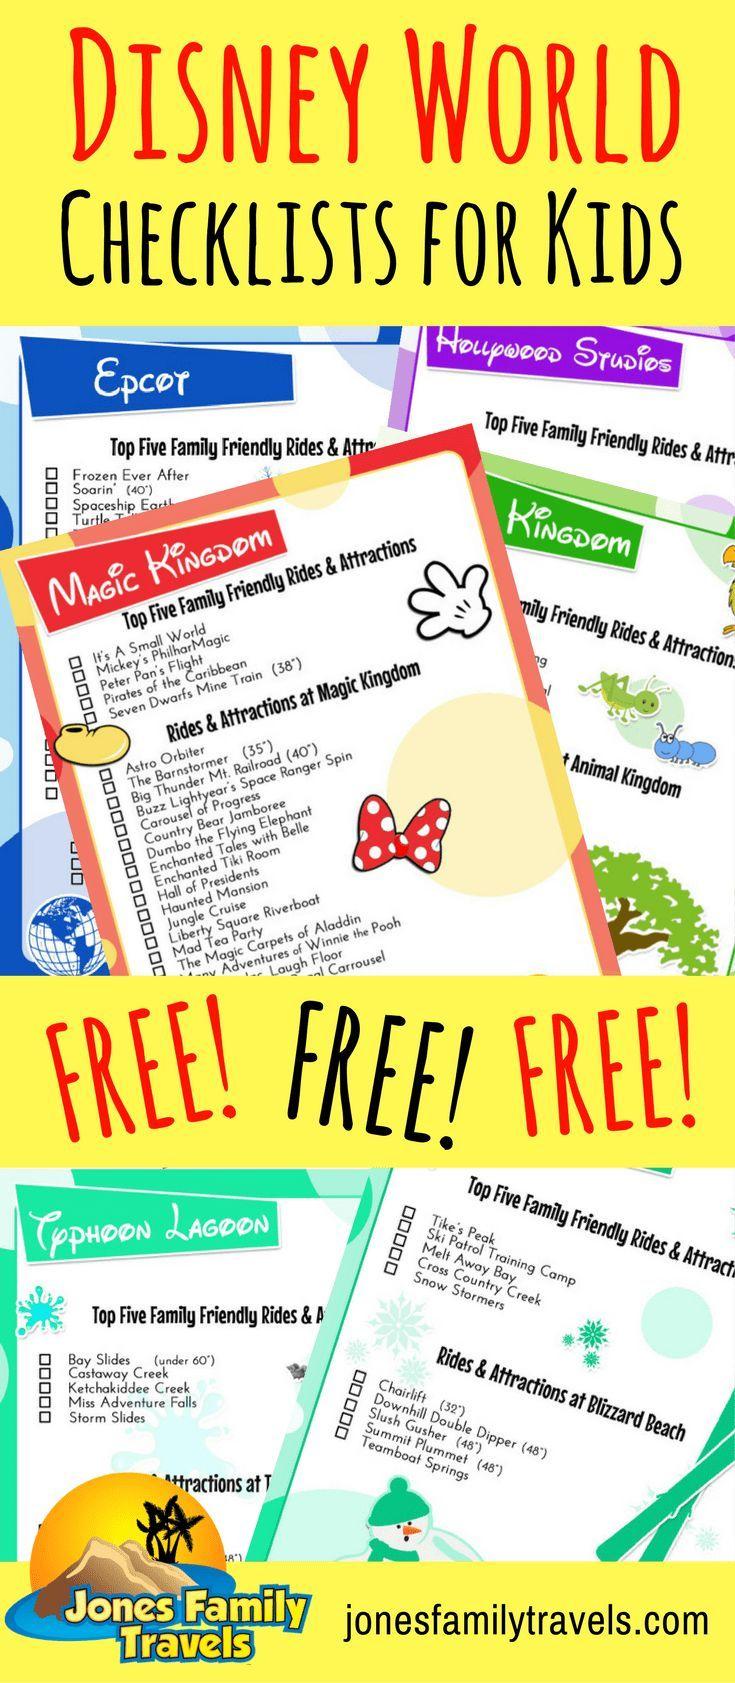 Free Disney Parks Printable Checklists For Kids | Disney